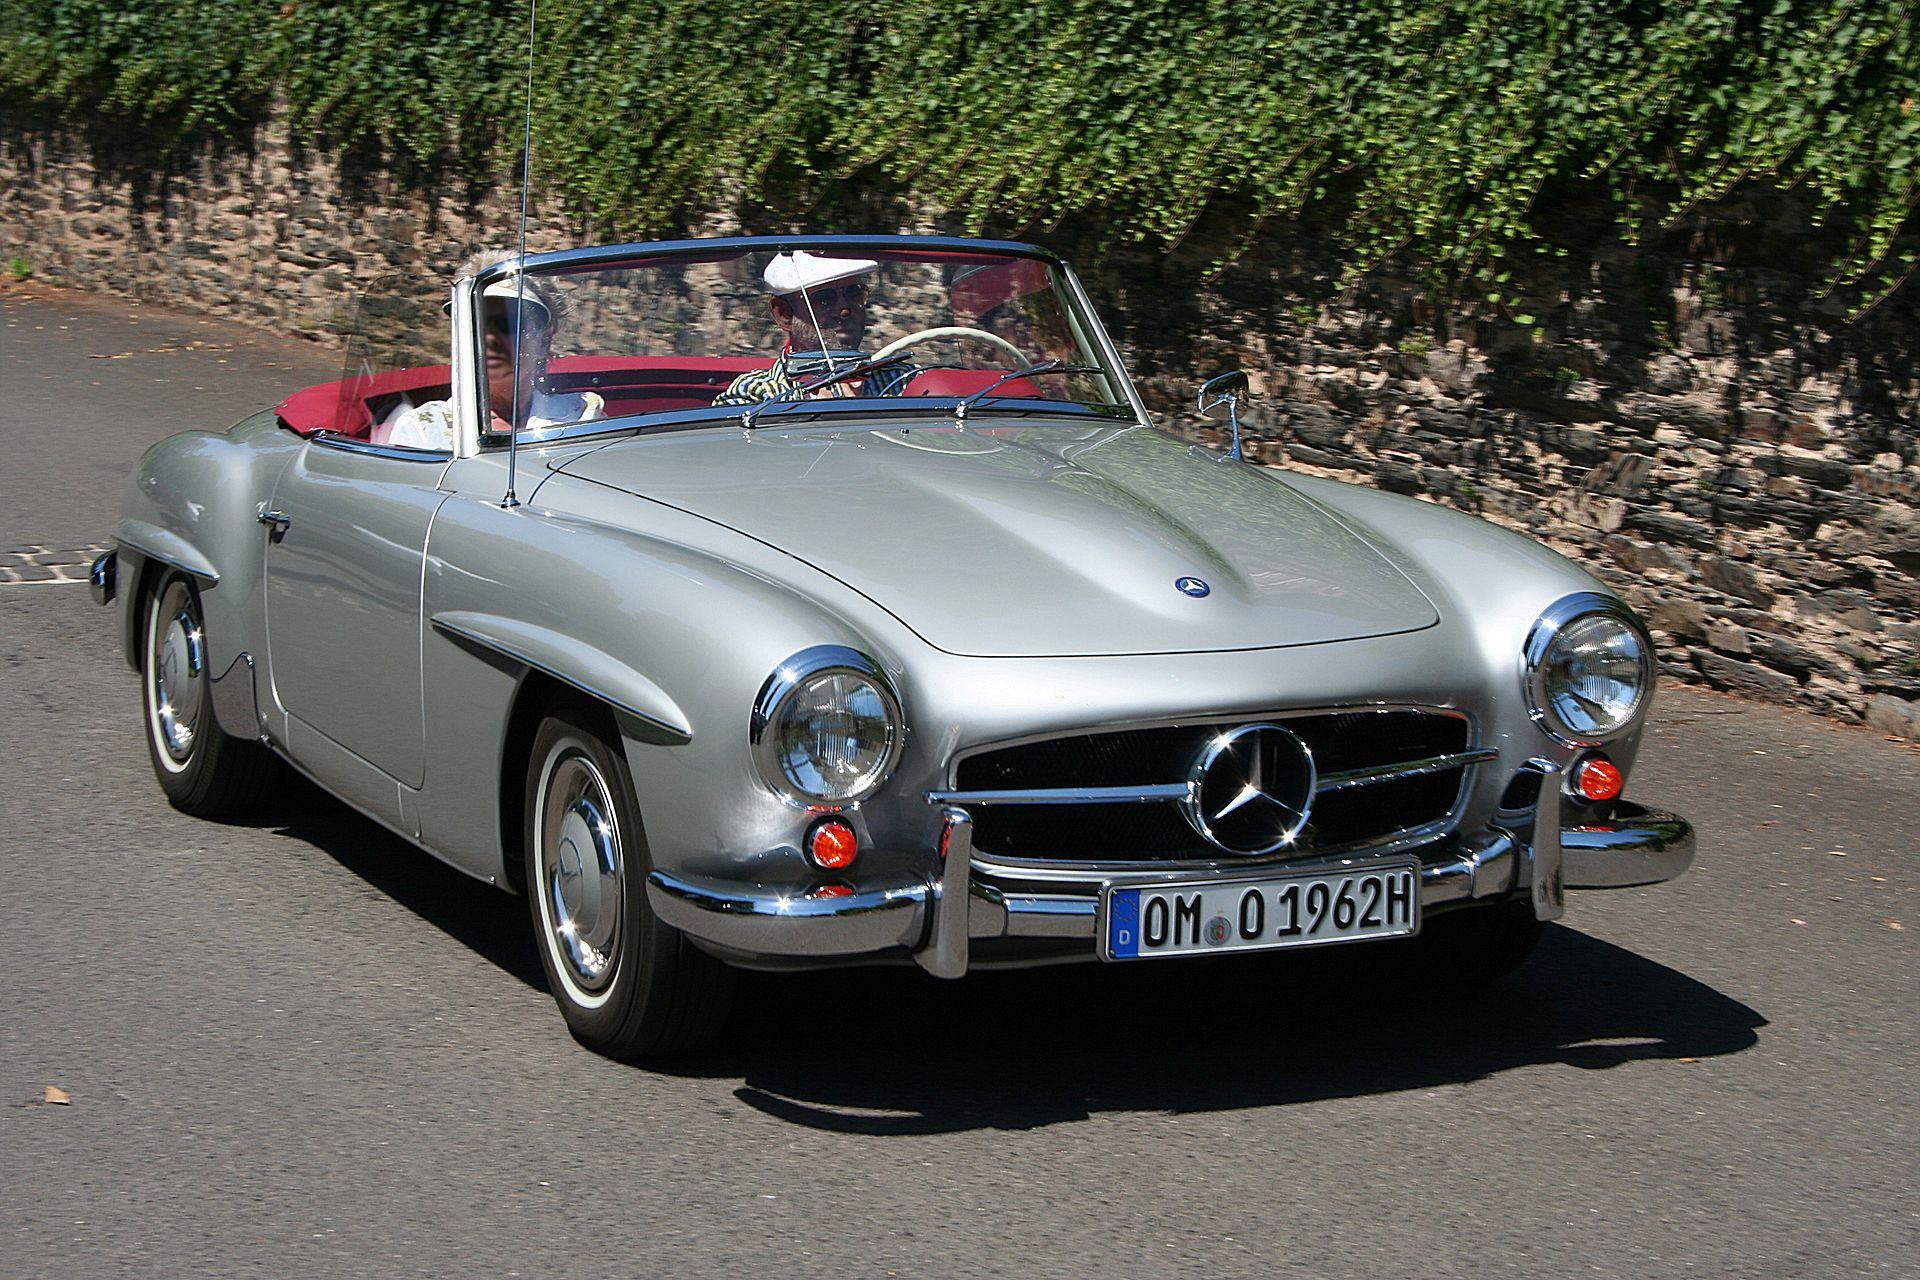 Mercedes benz 190 sl wikipedia for Mercedes benz wiki